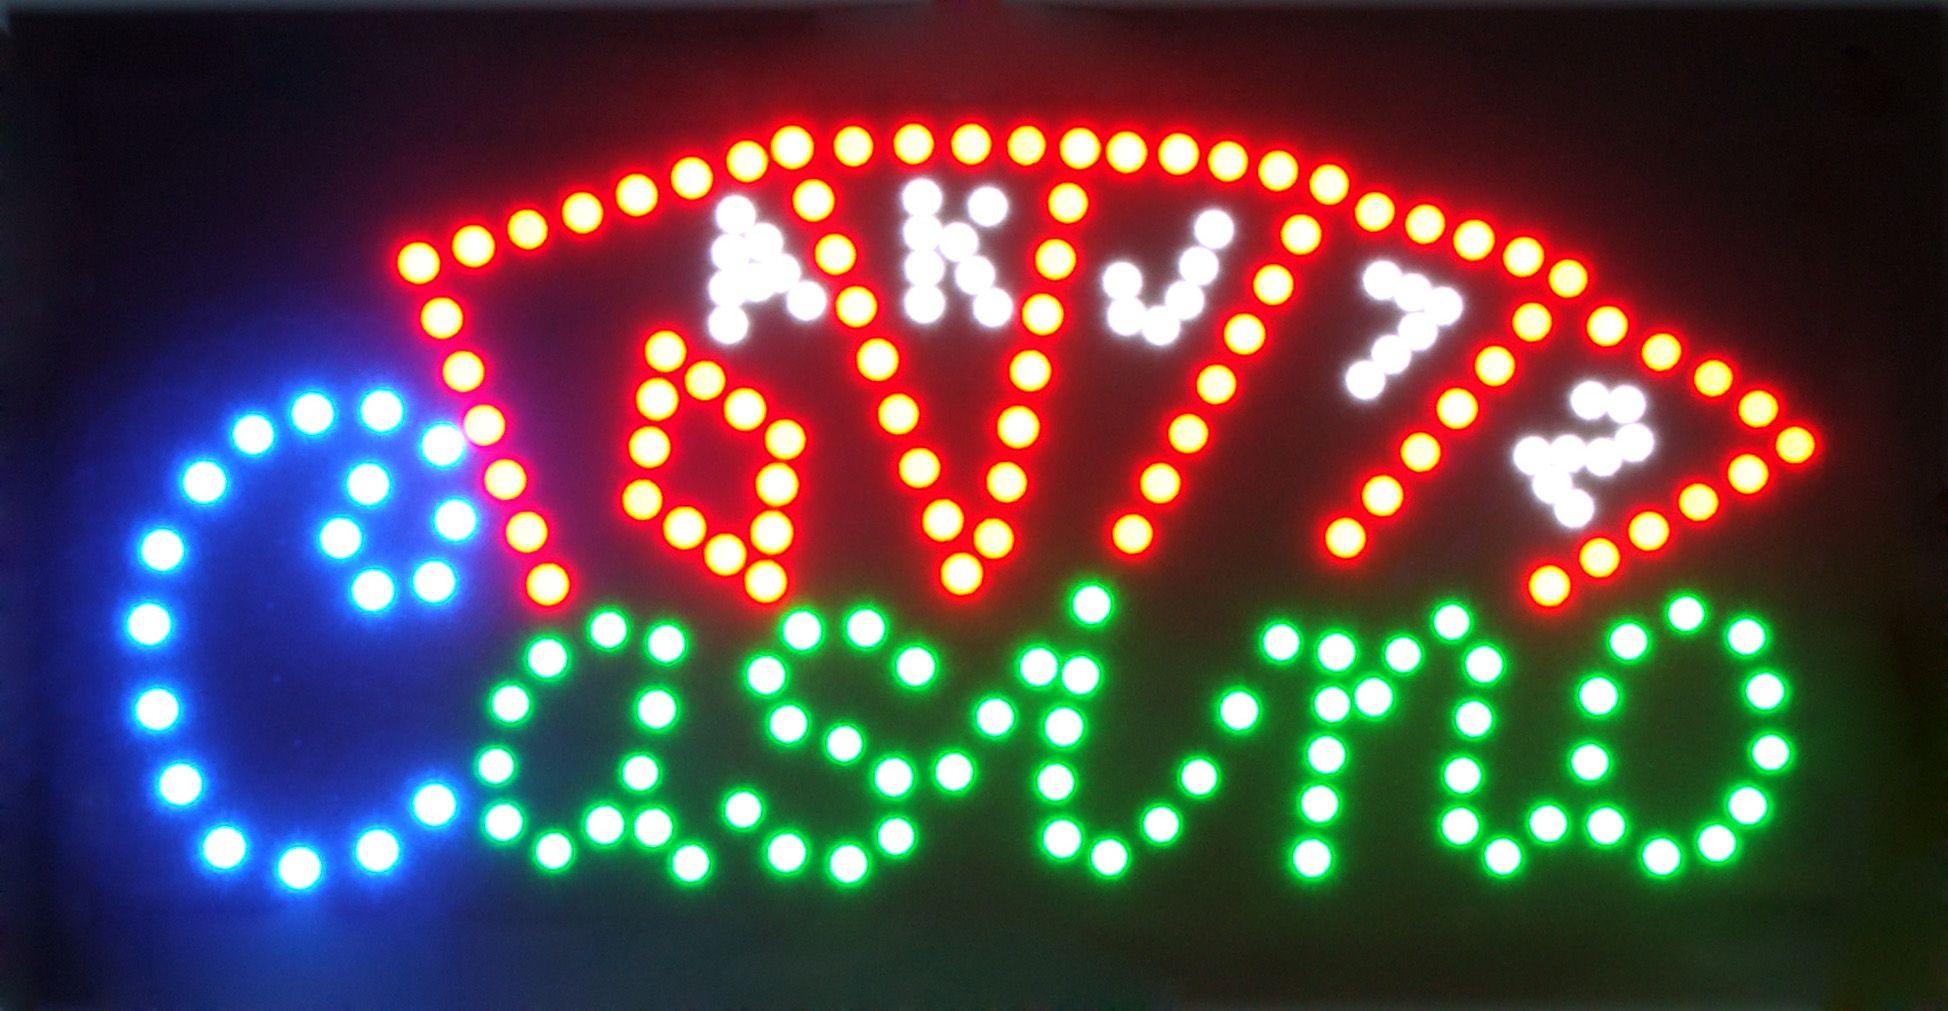 Lights online Play 146645